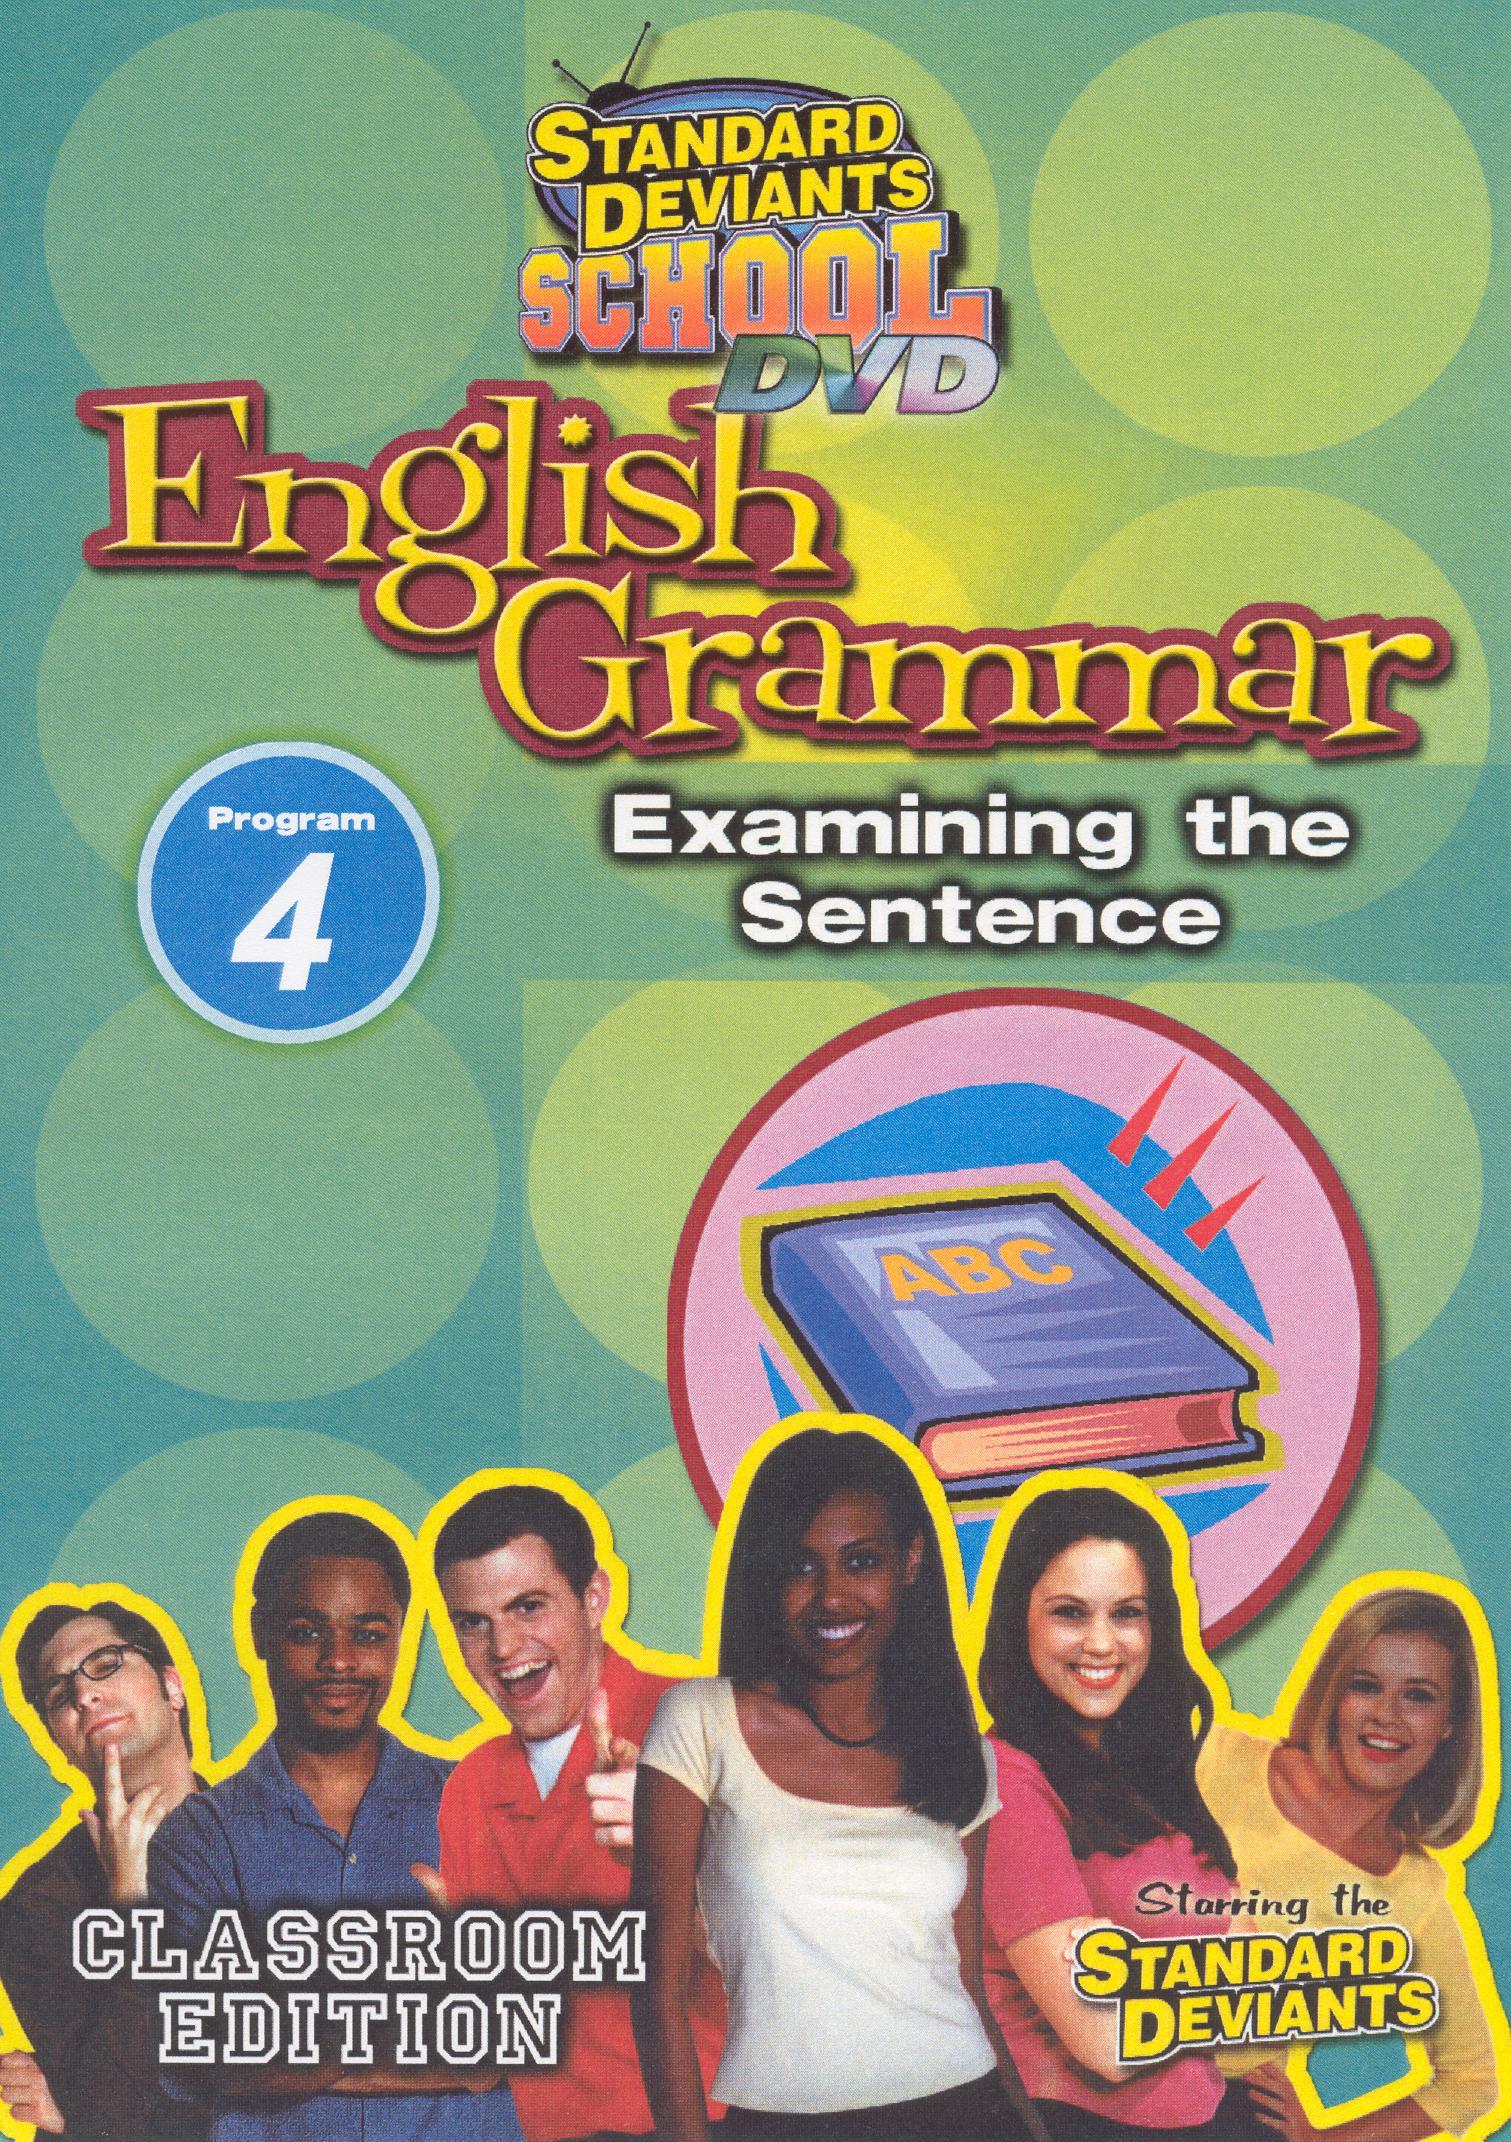 Standard Deviants School: English Grammar, Program 4